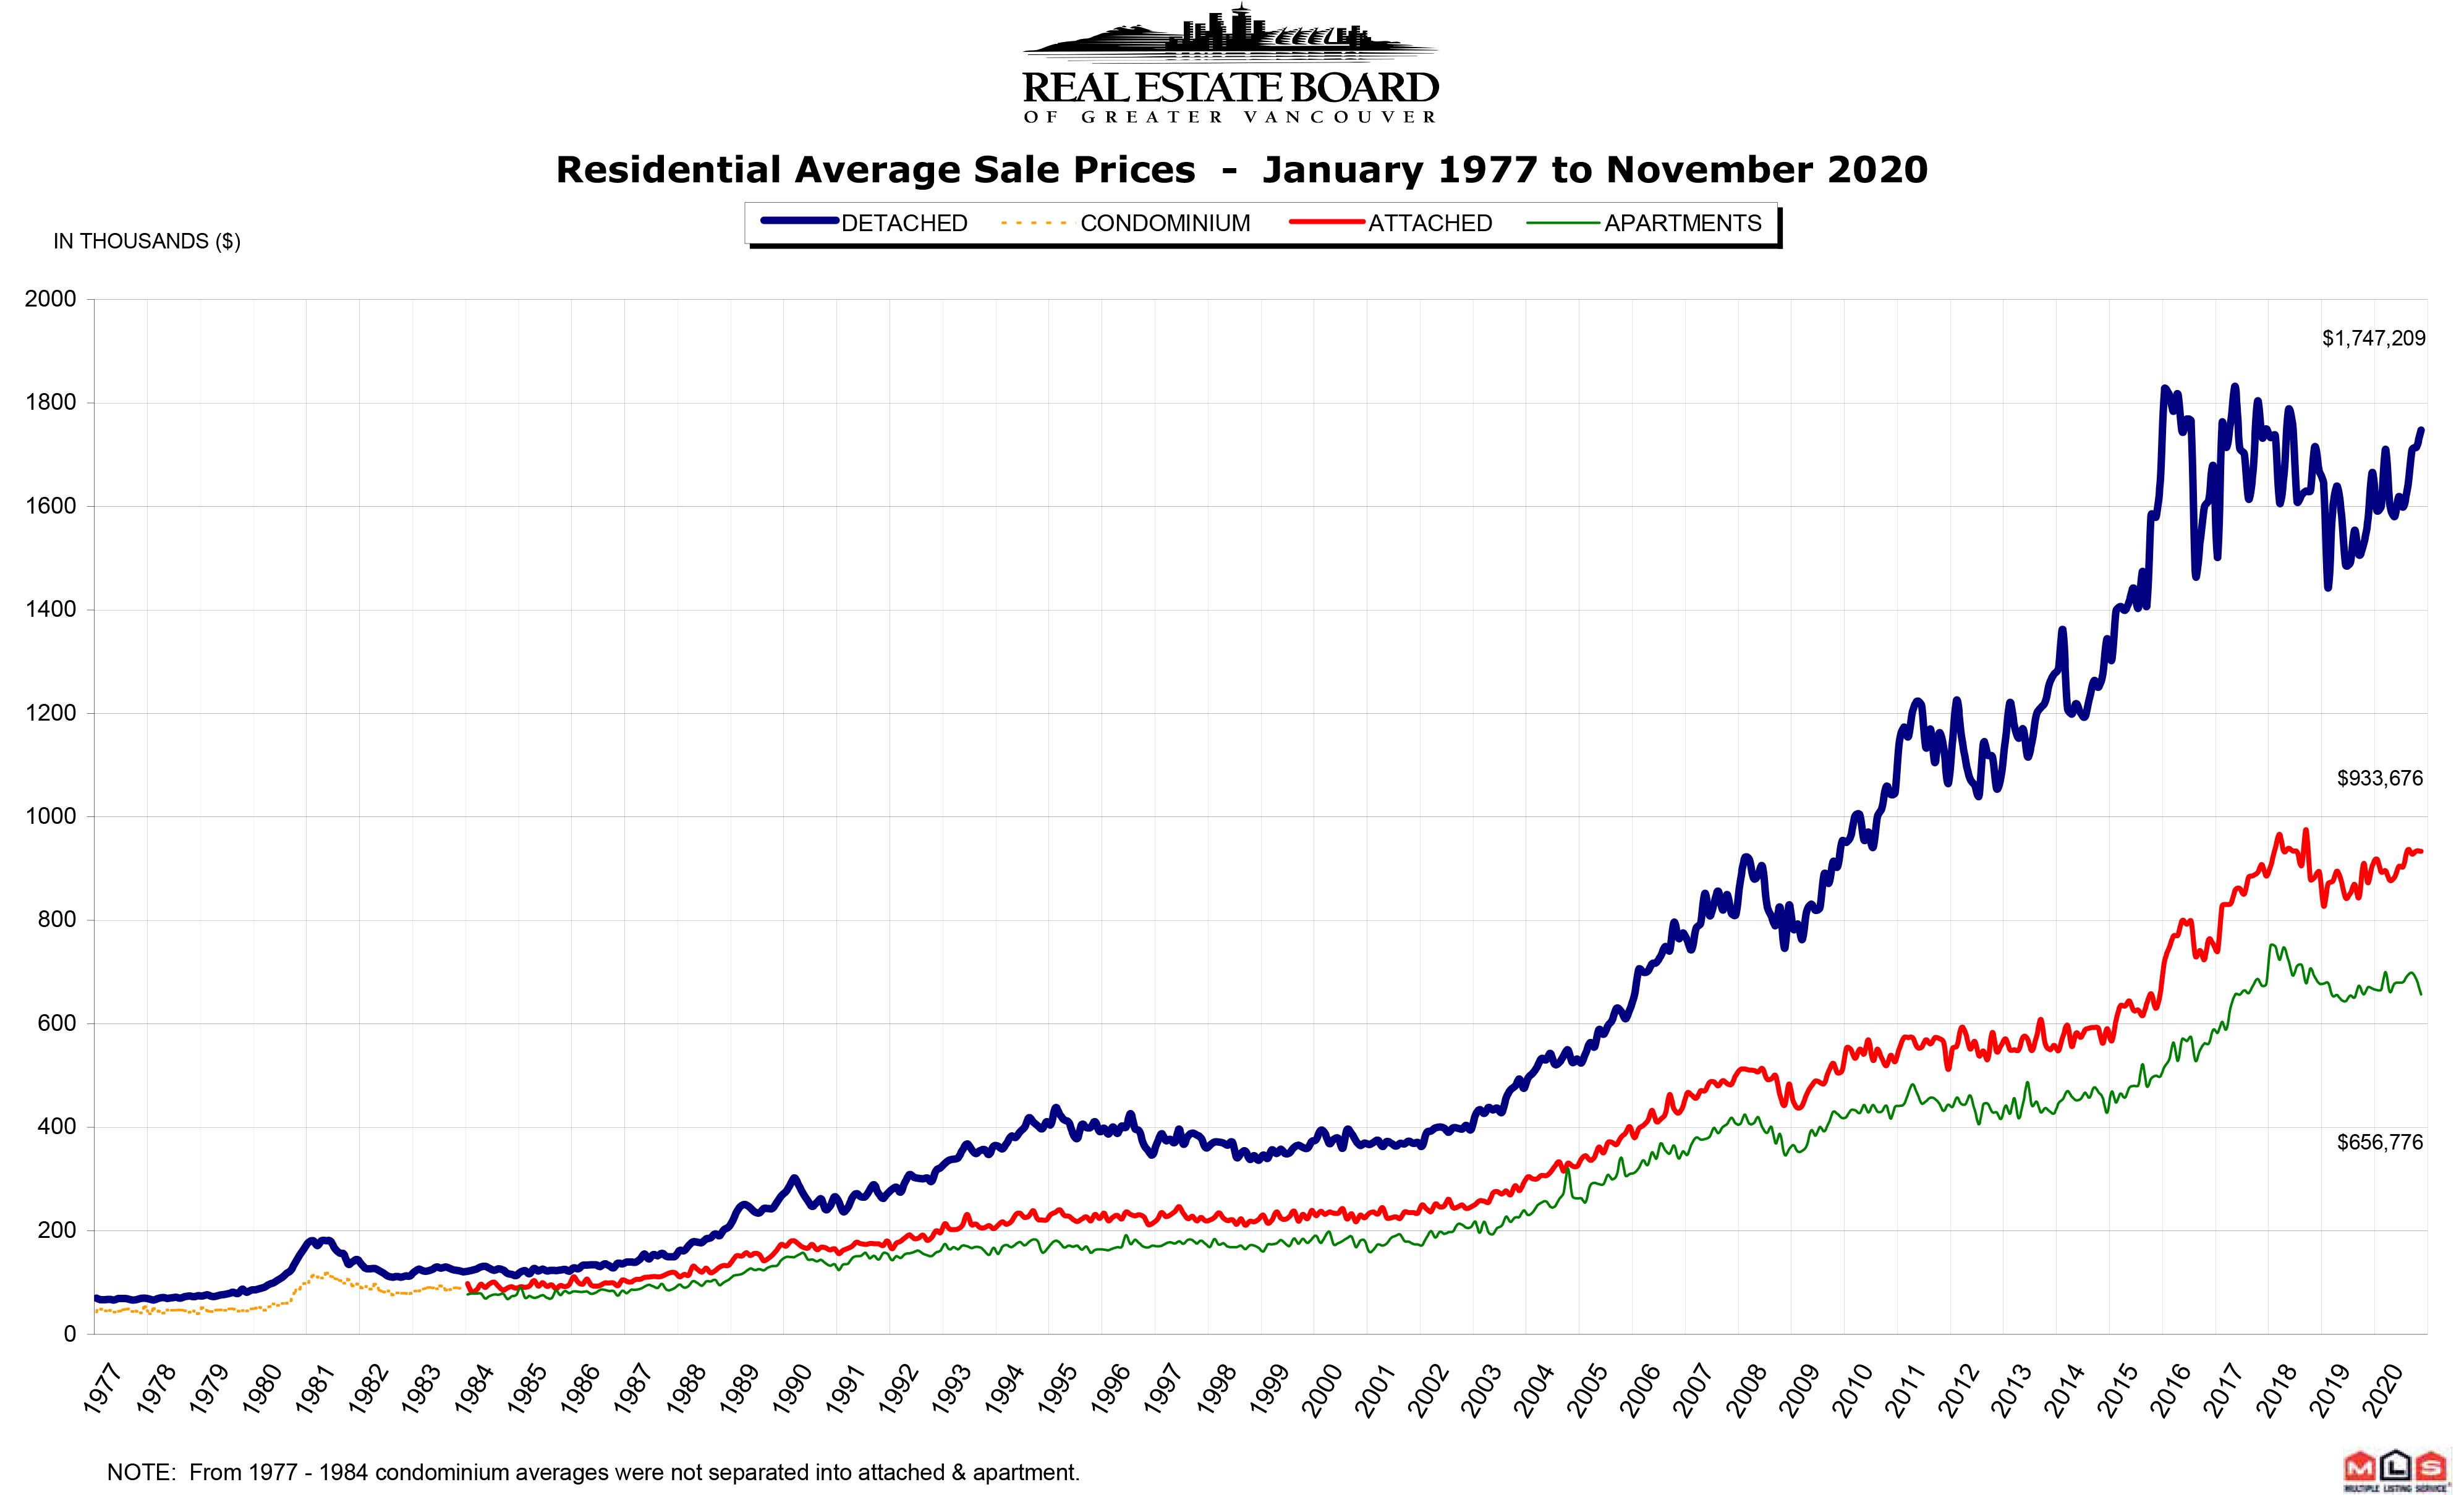 REBGV Stats Graph November 2020